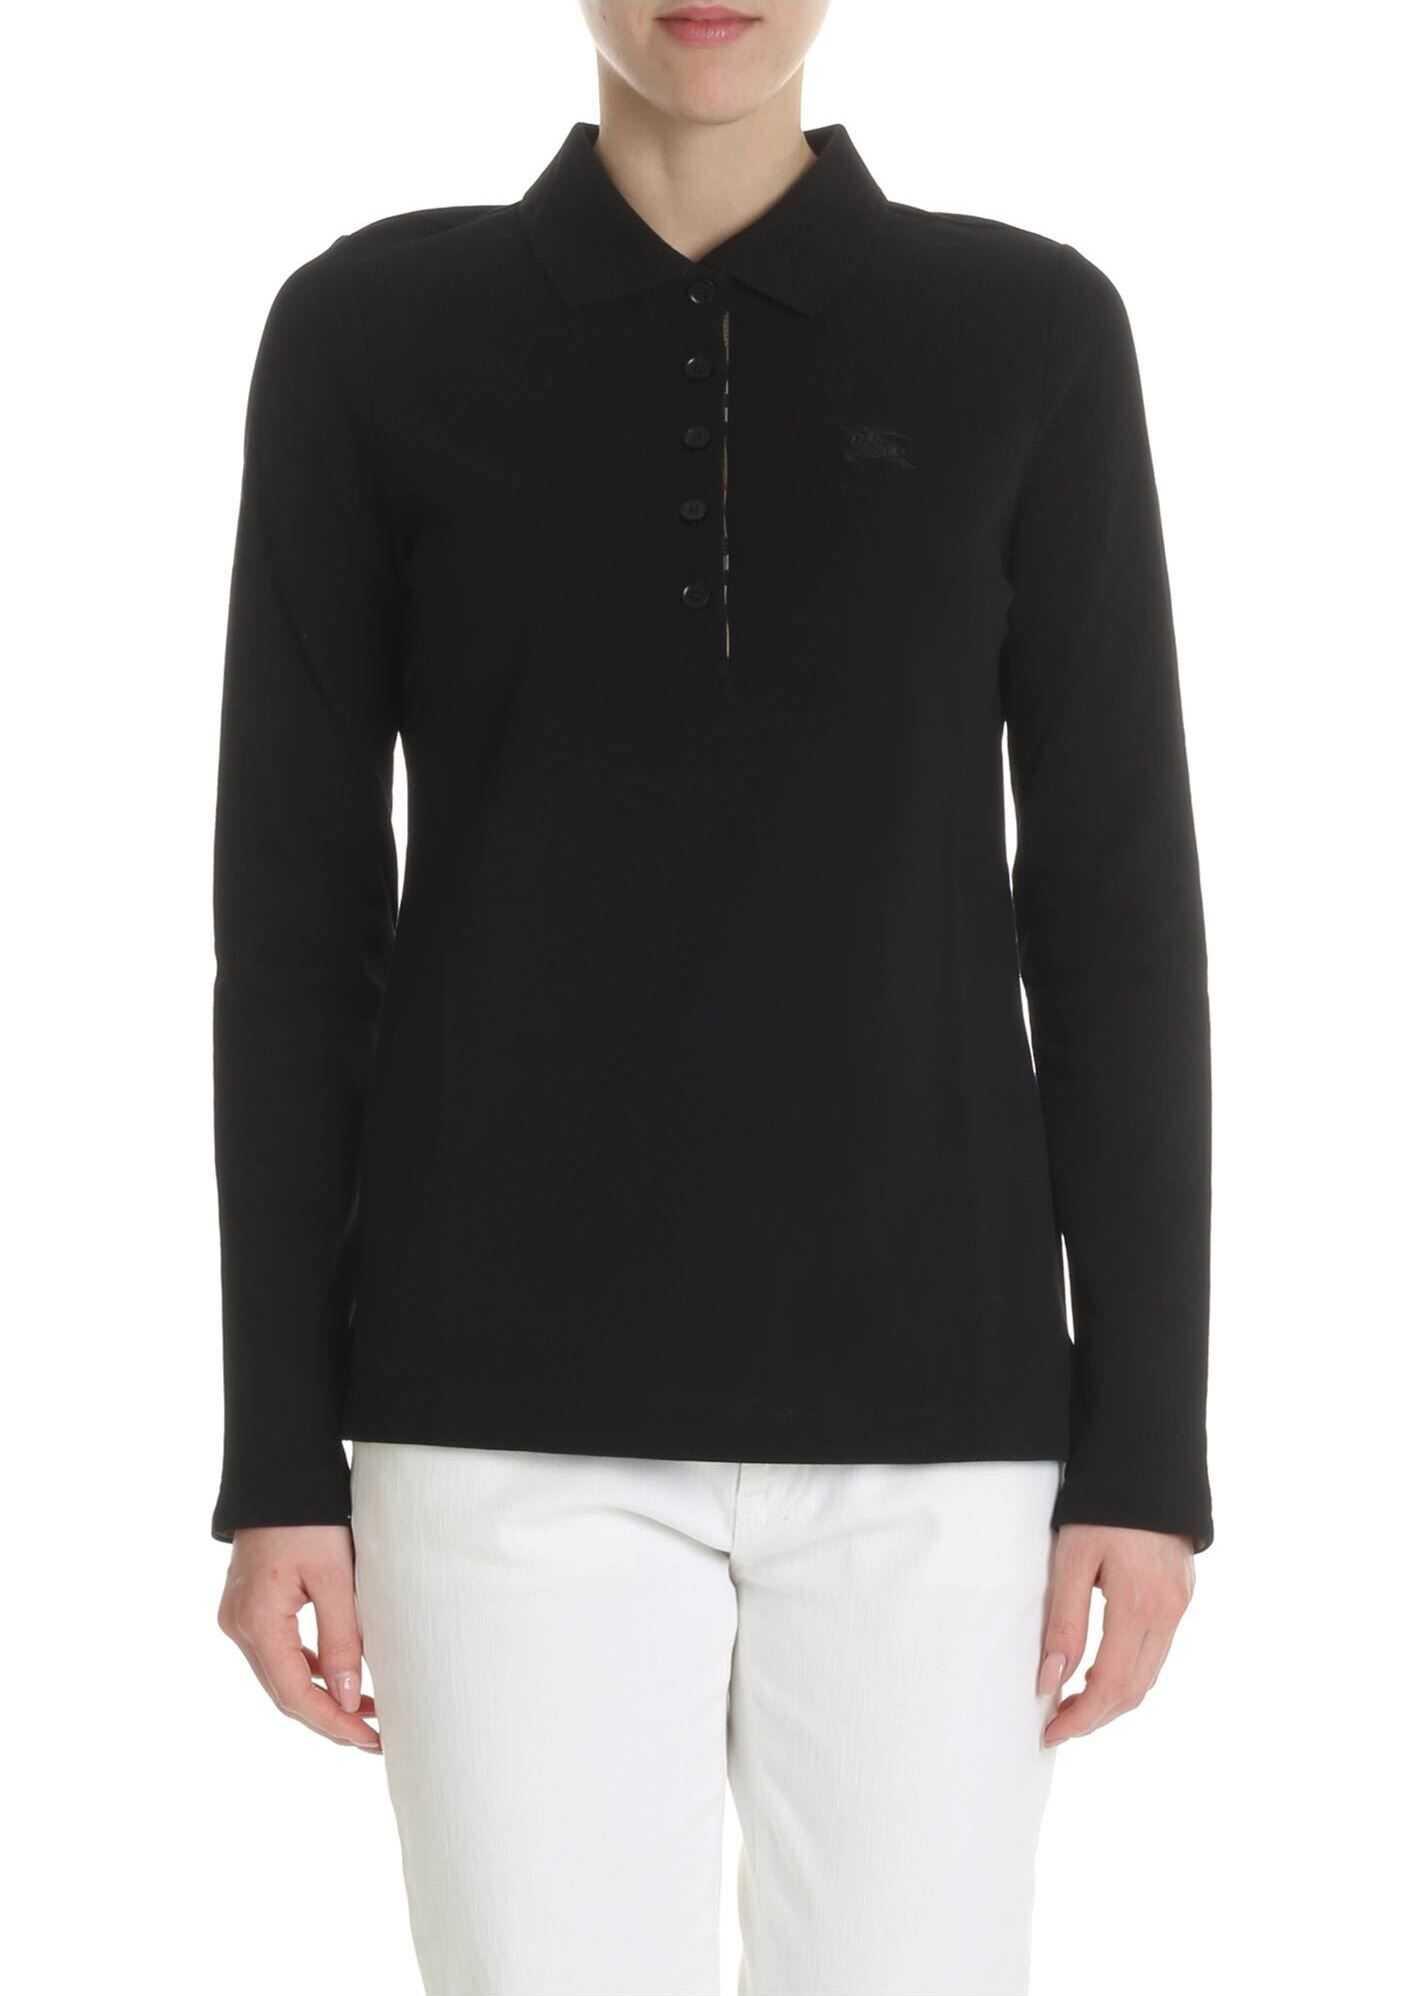 Burberry Black Long-Sleeved Polo Black